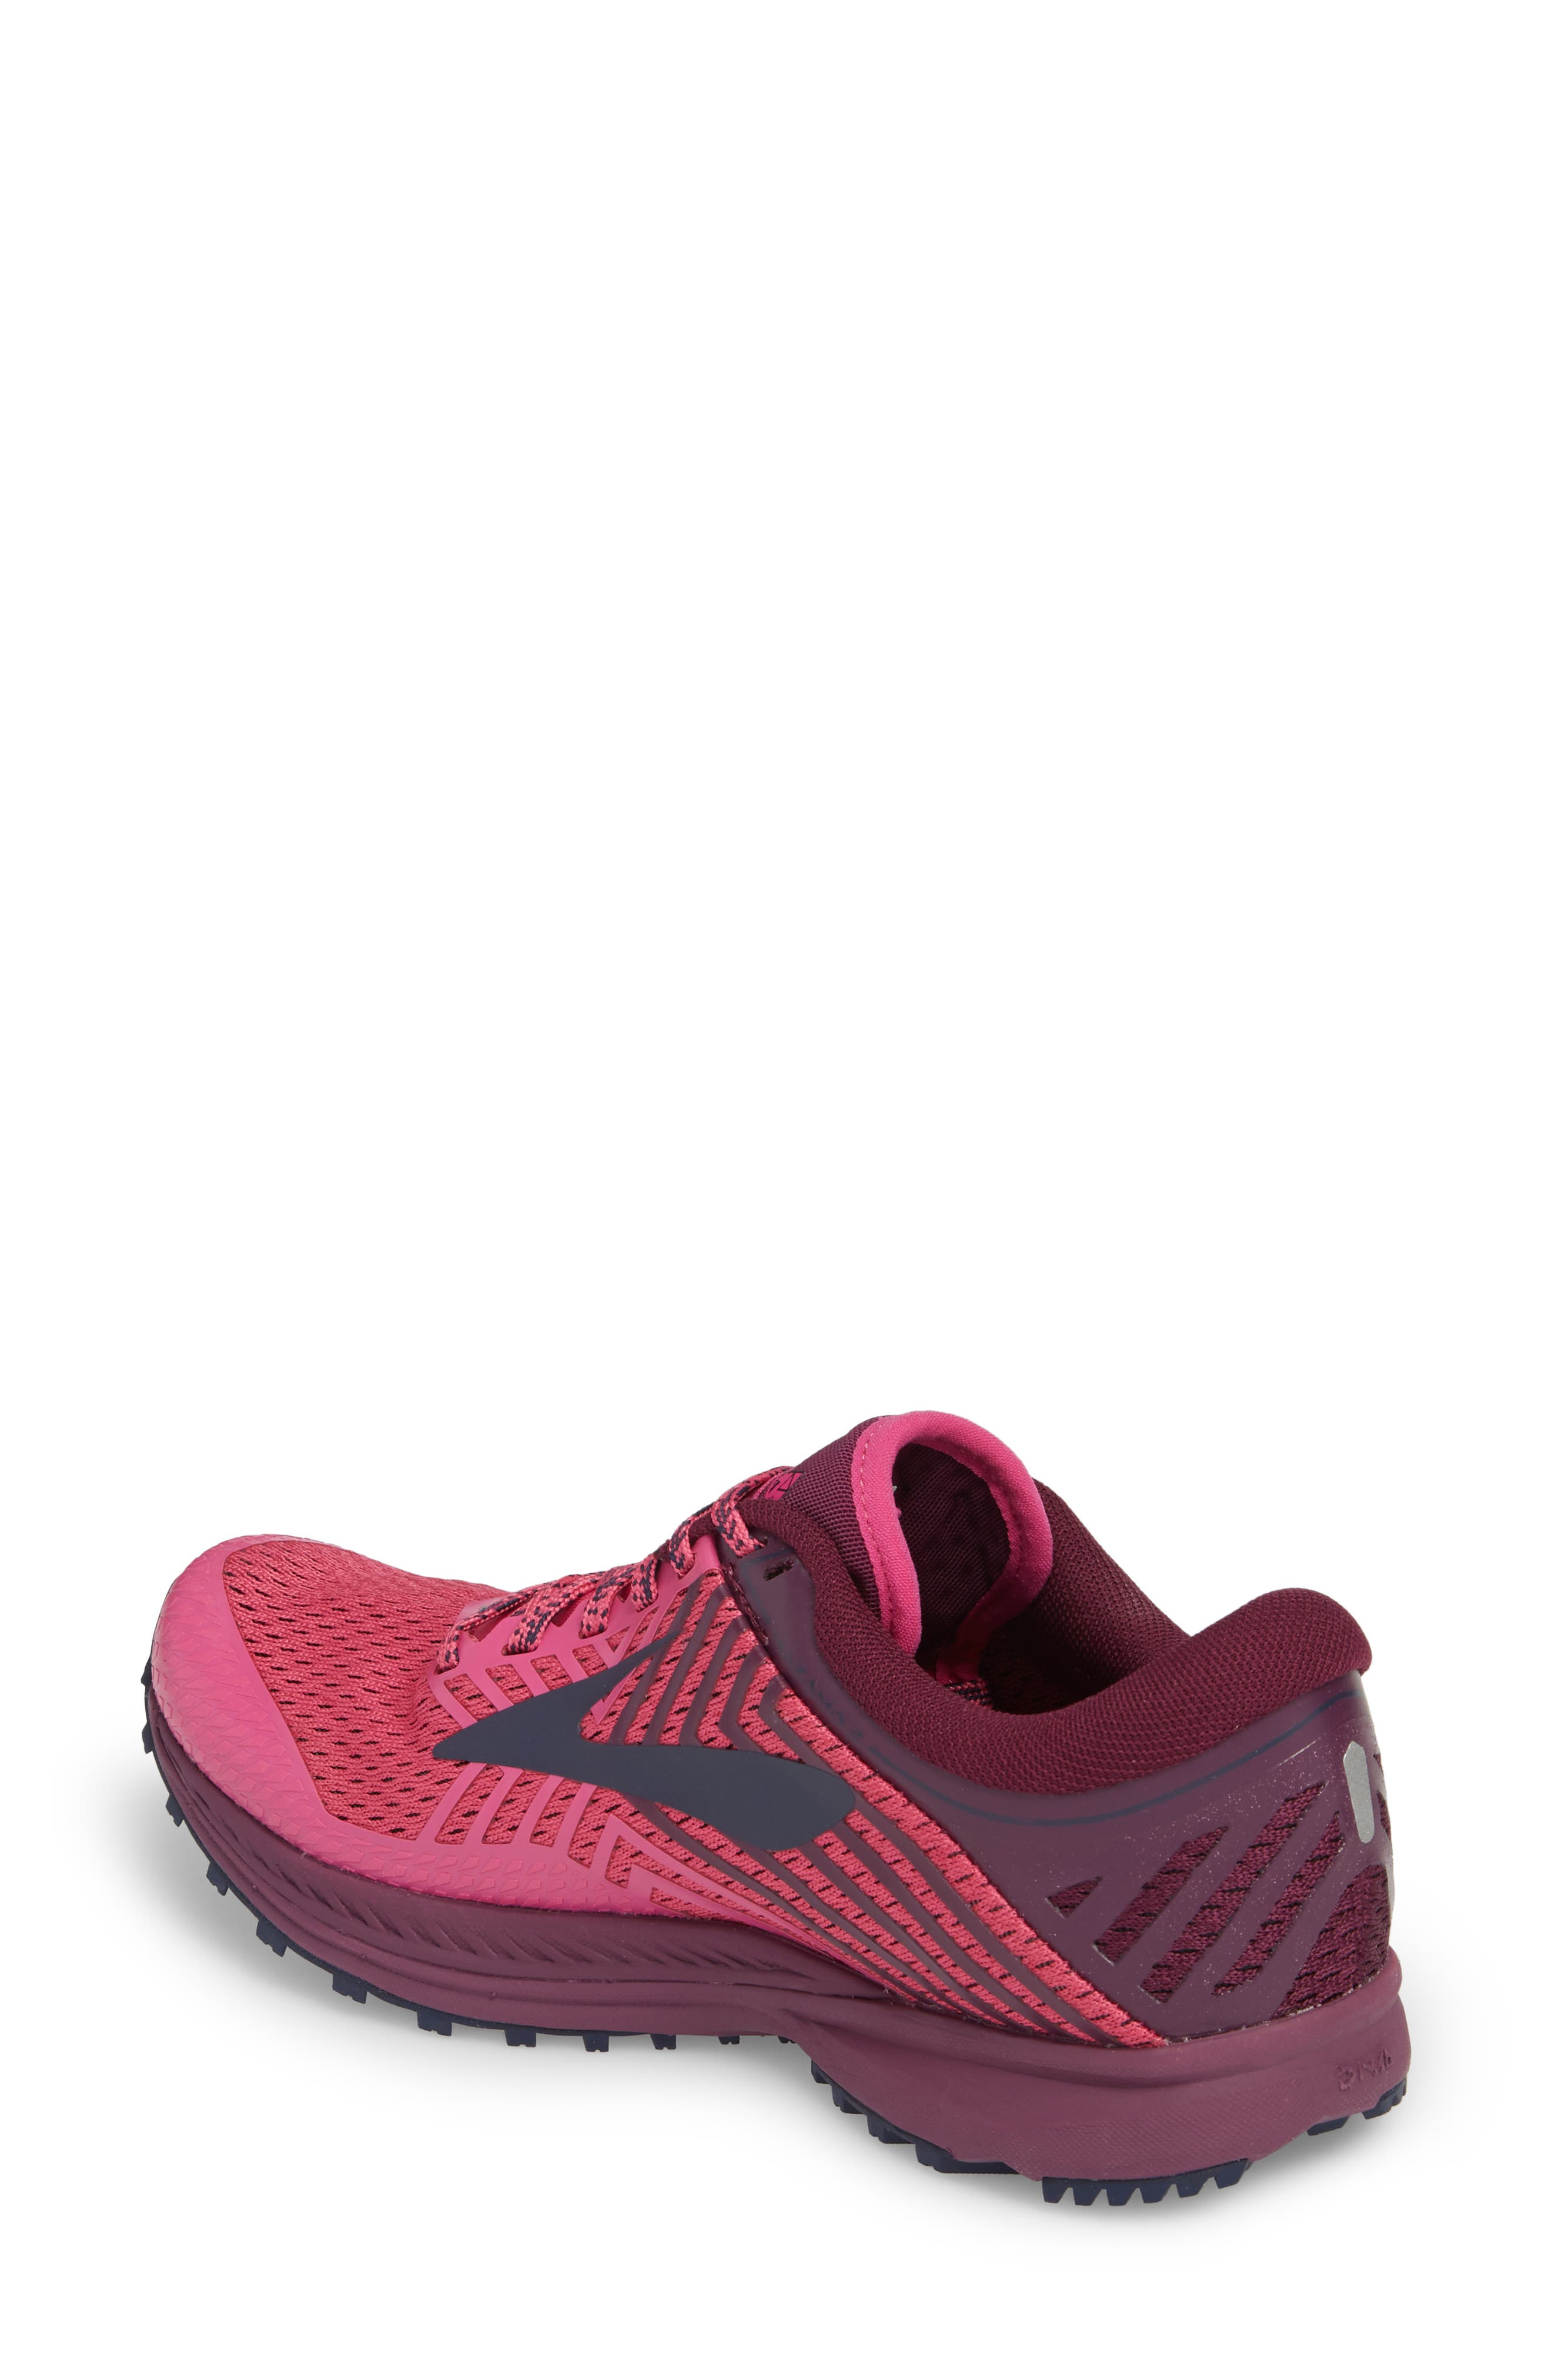 Mazama 2 Trail Running Shoe,                             Alternate thumbnail 2, color,                             PINK/ PLUM/ NAVY